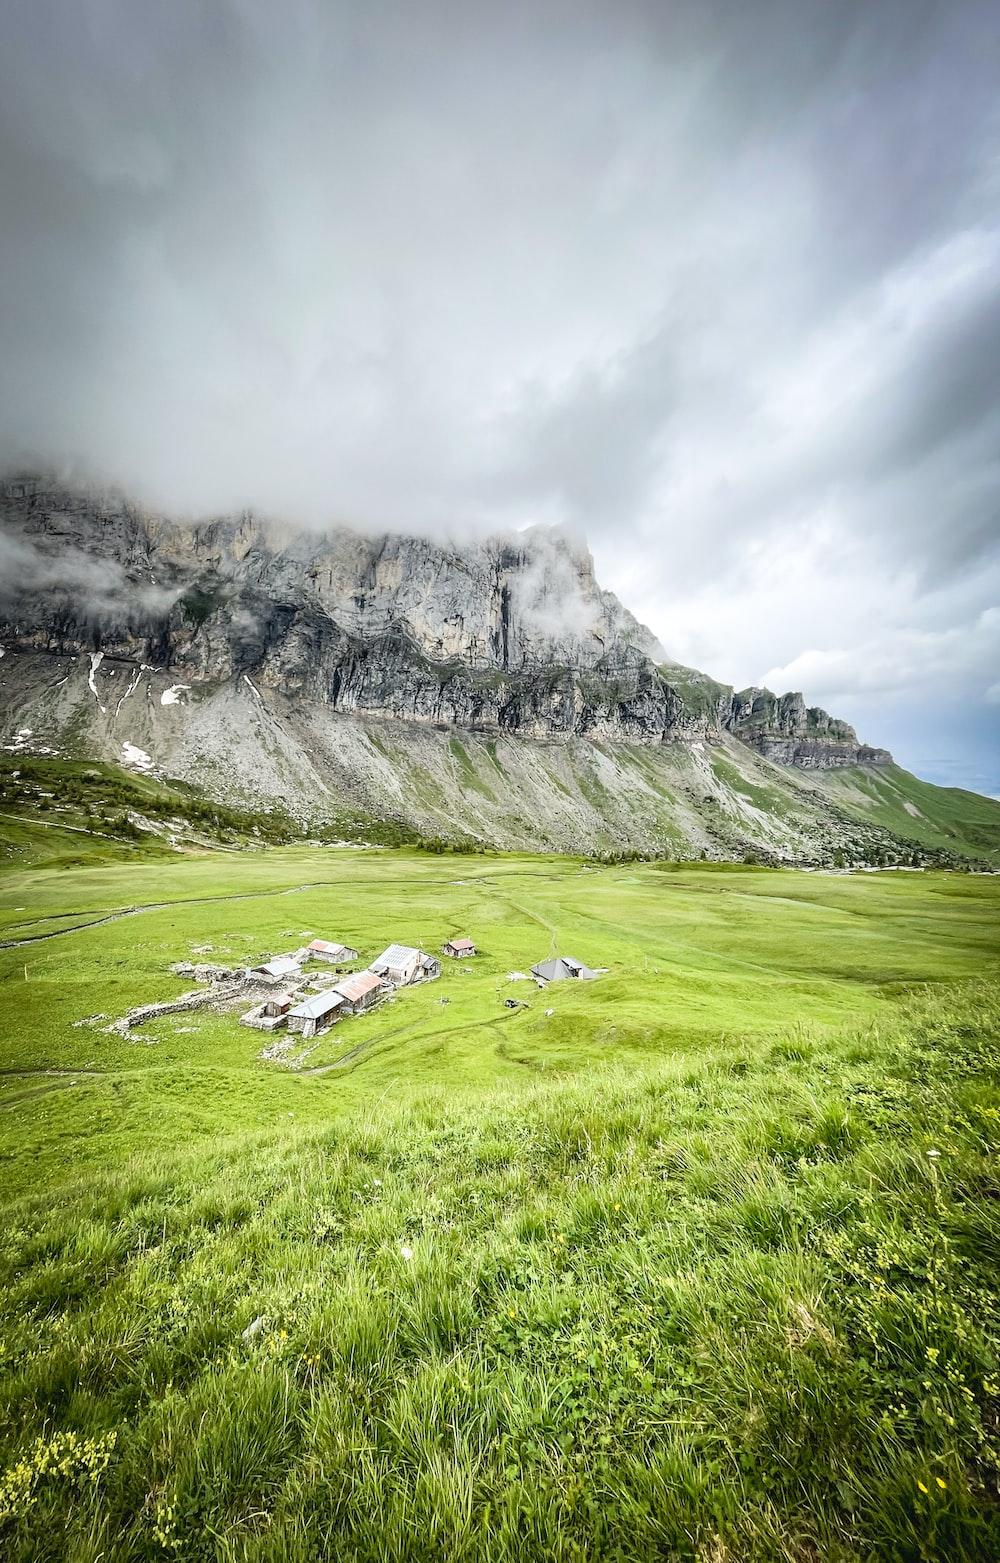 green grass field near gray mountain under white sky during daytime